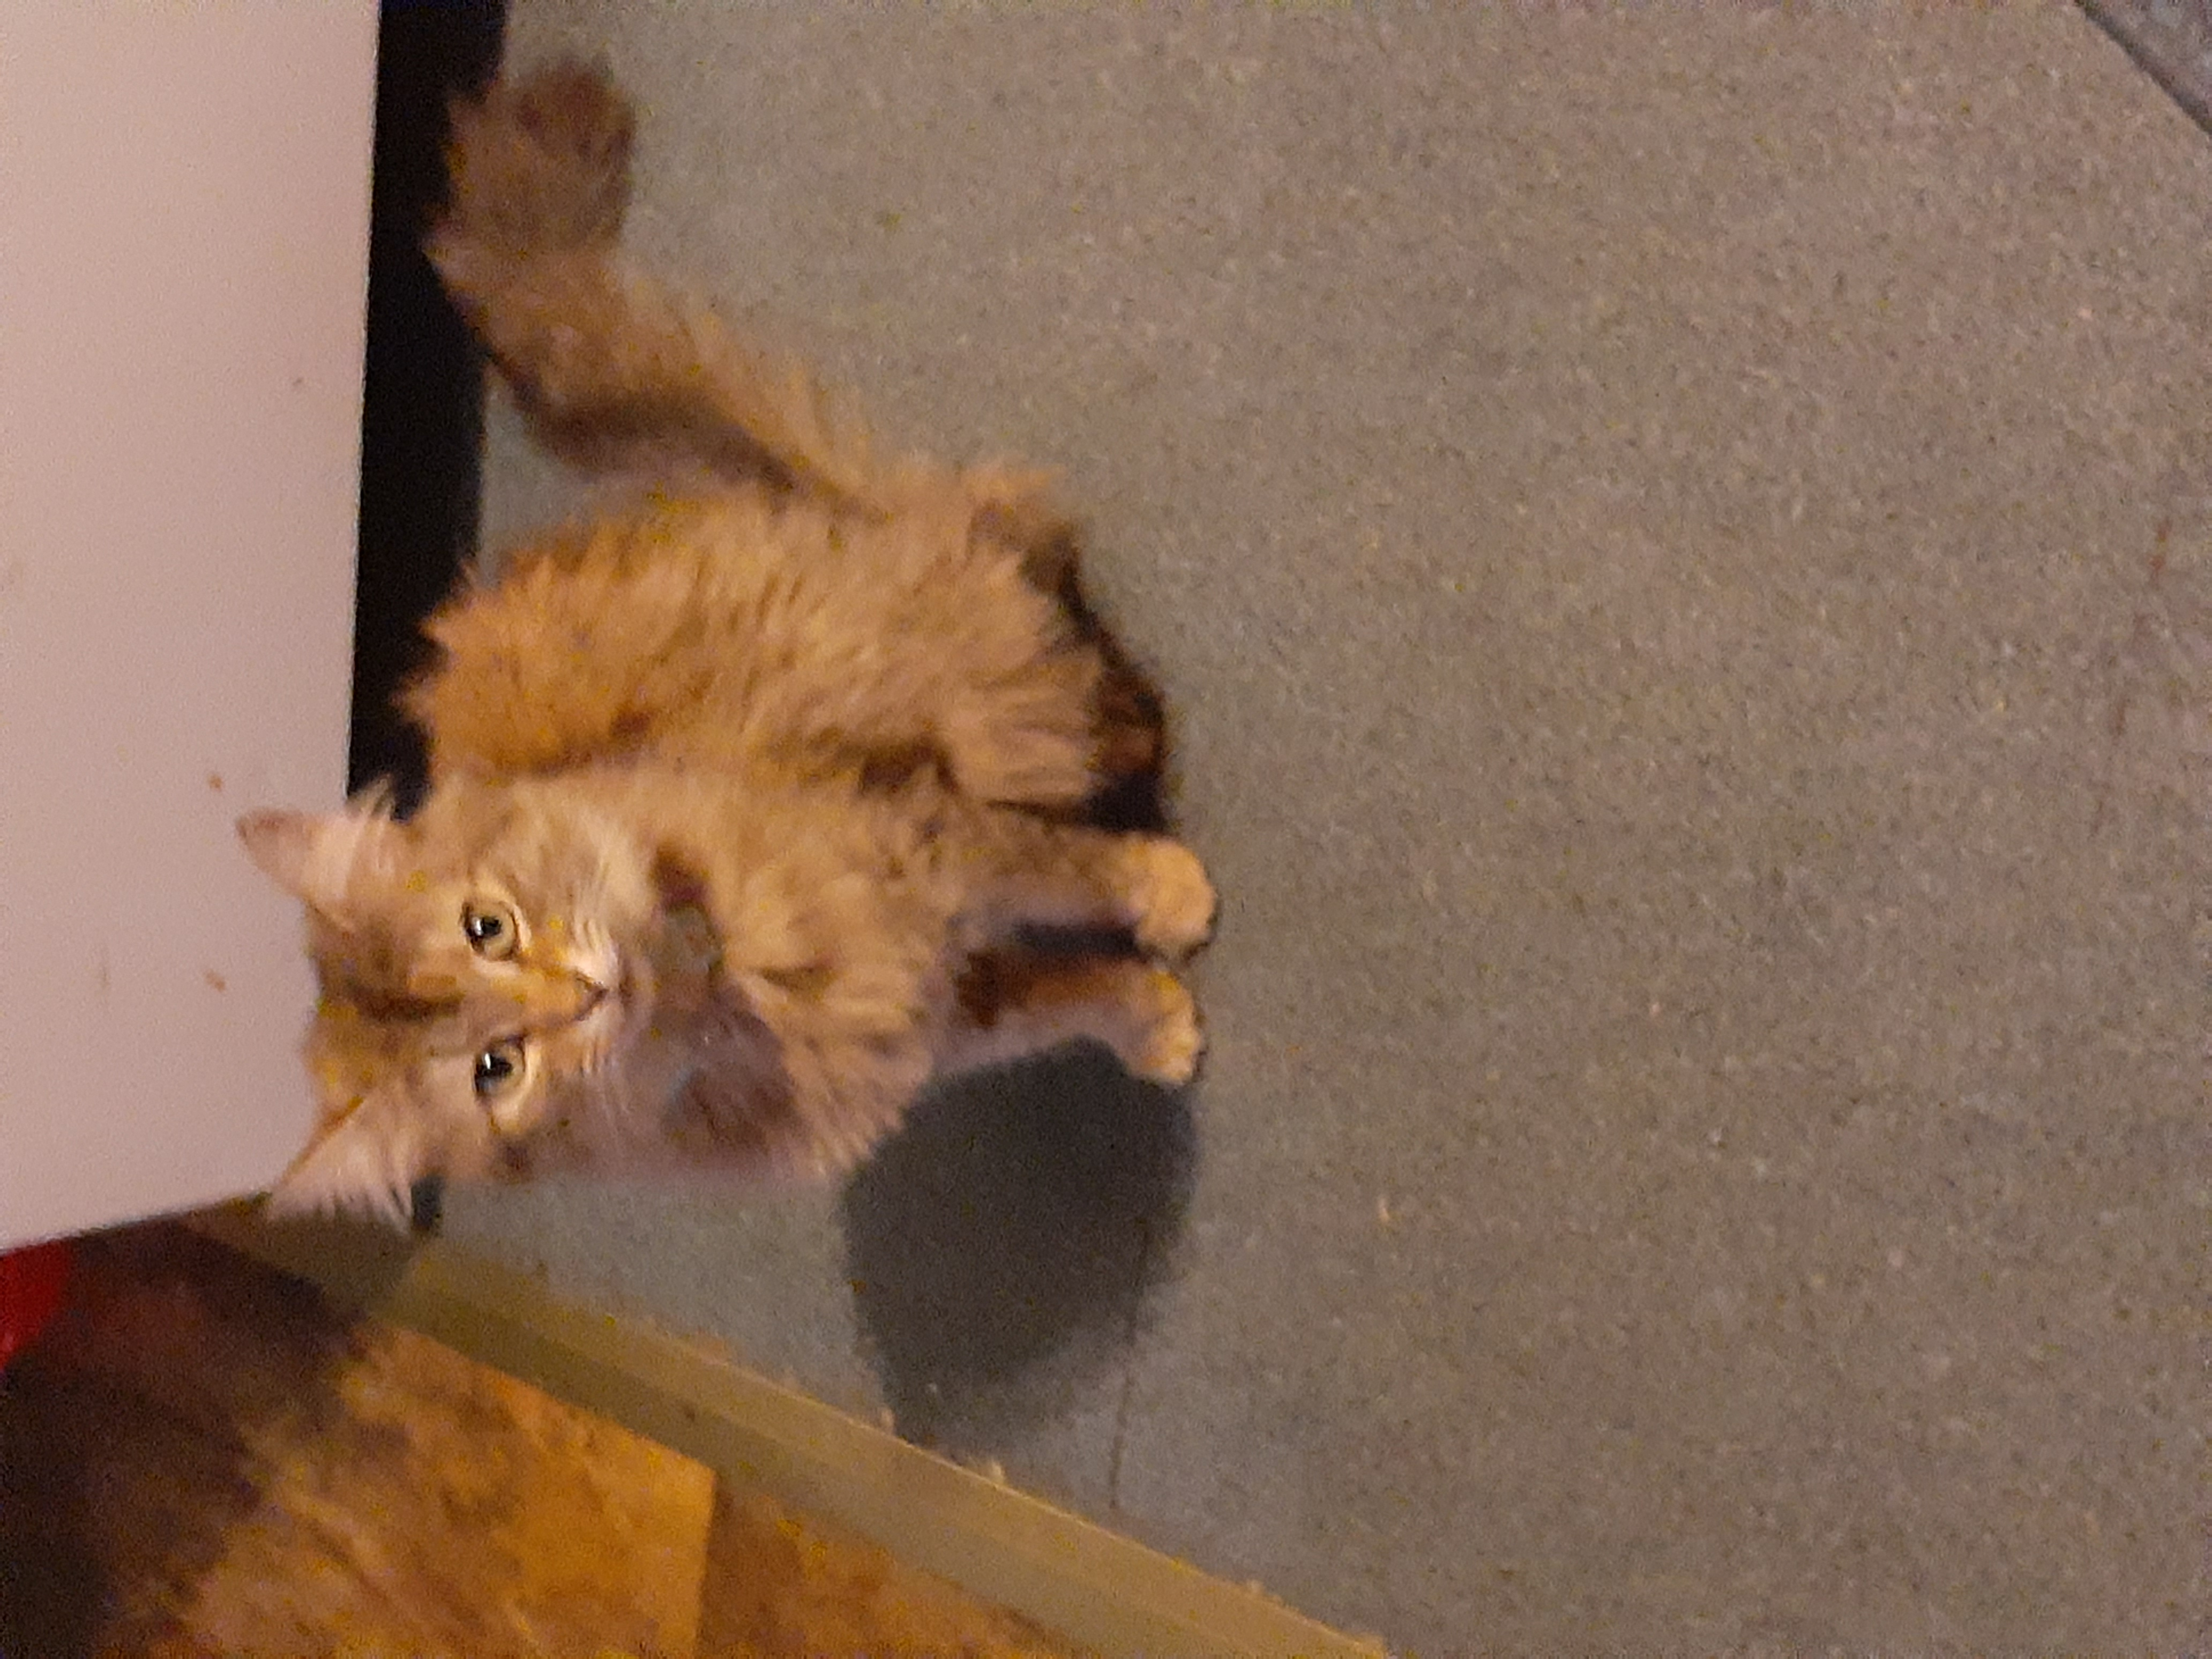 adoptable Cat in Huntington,WV named Buzz